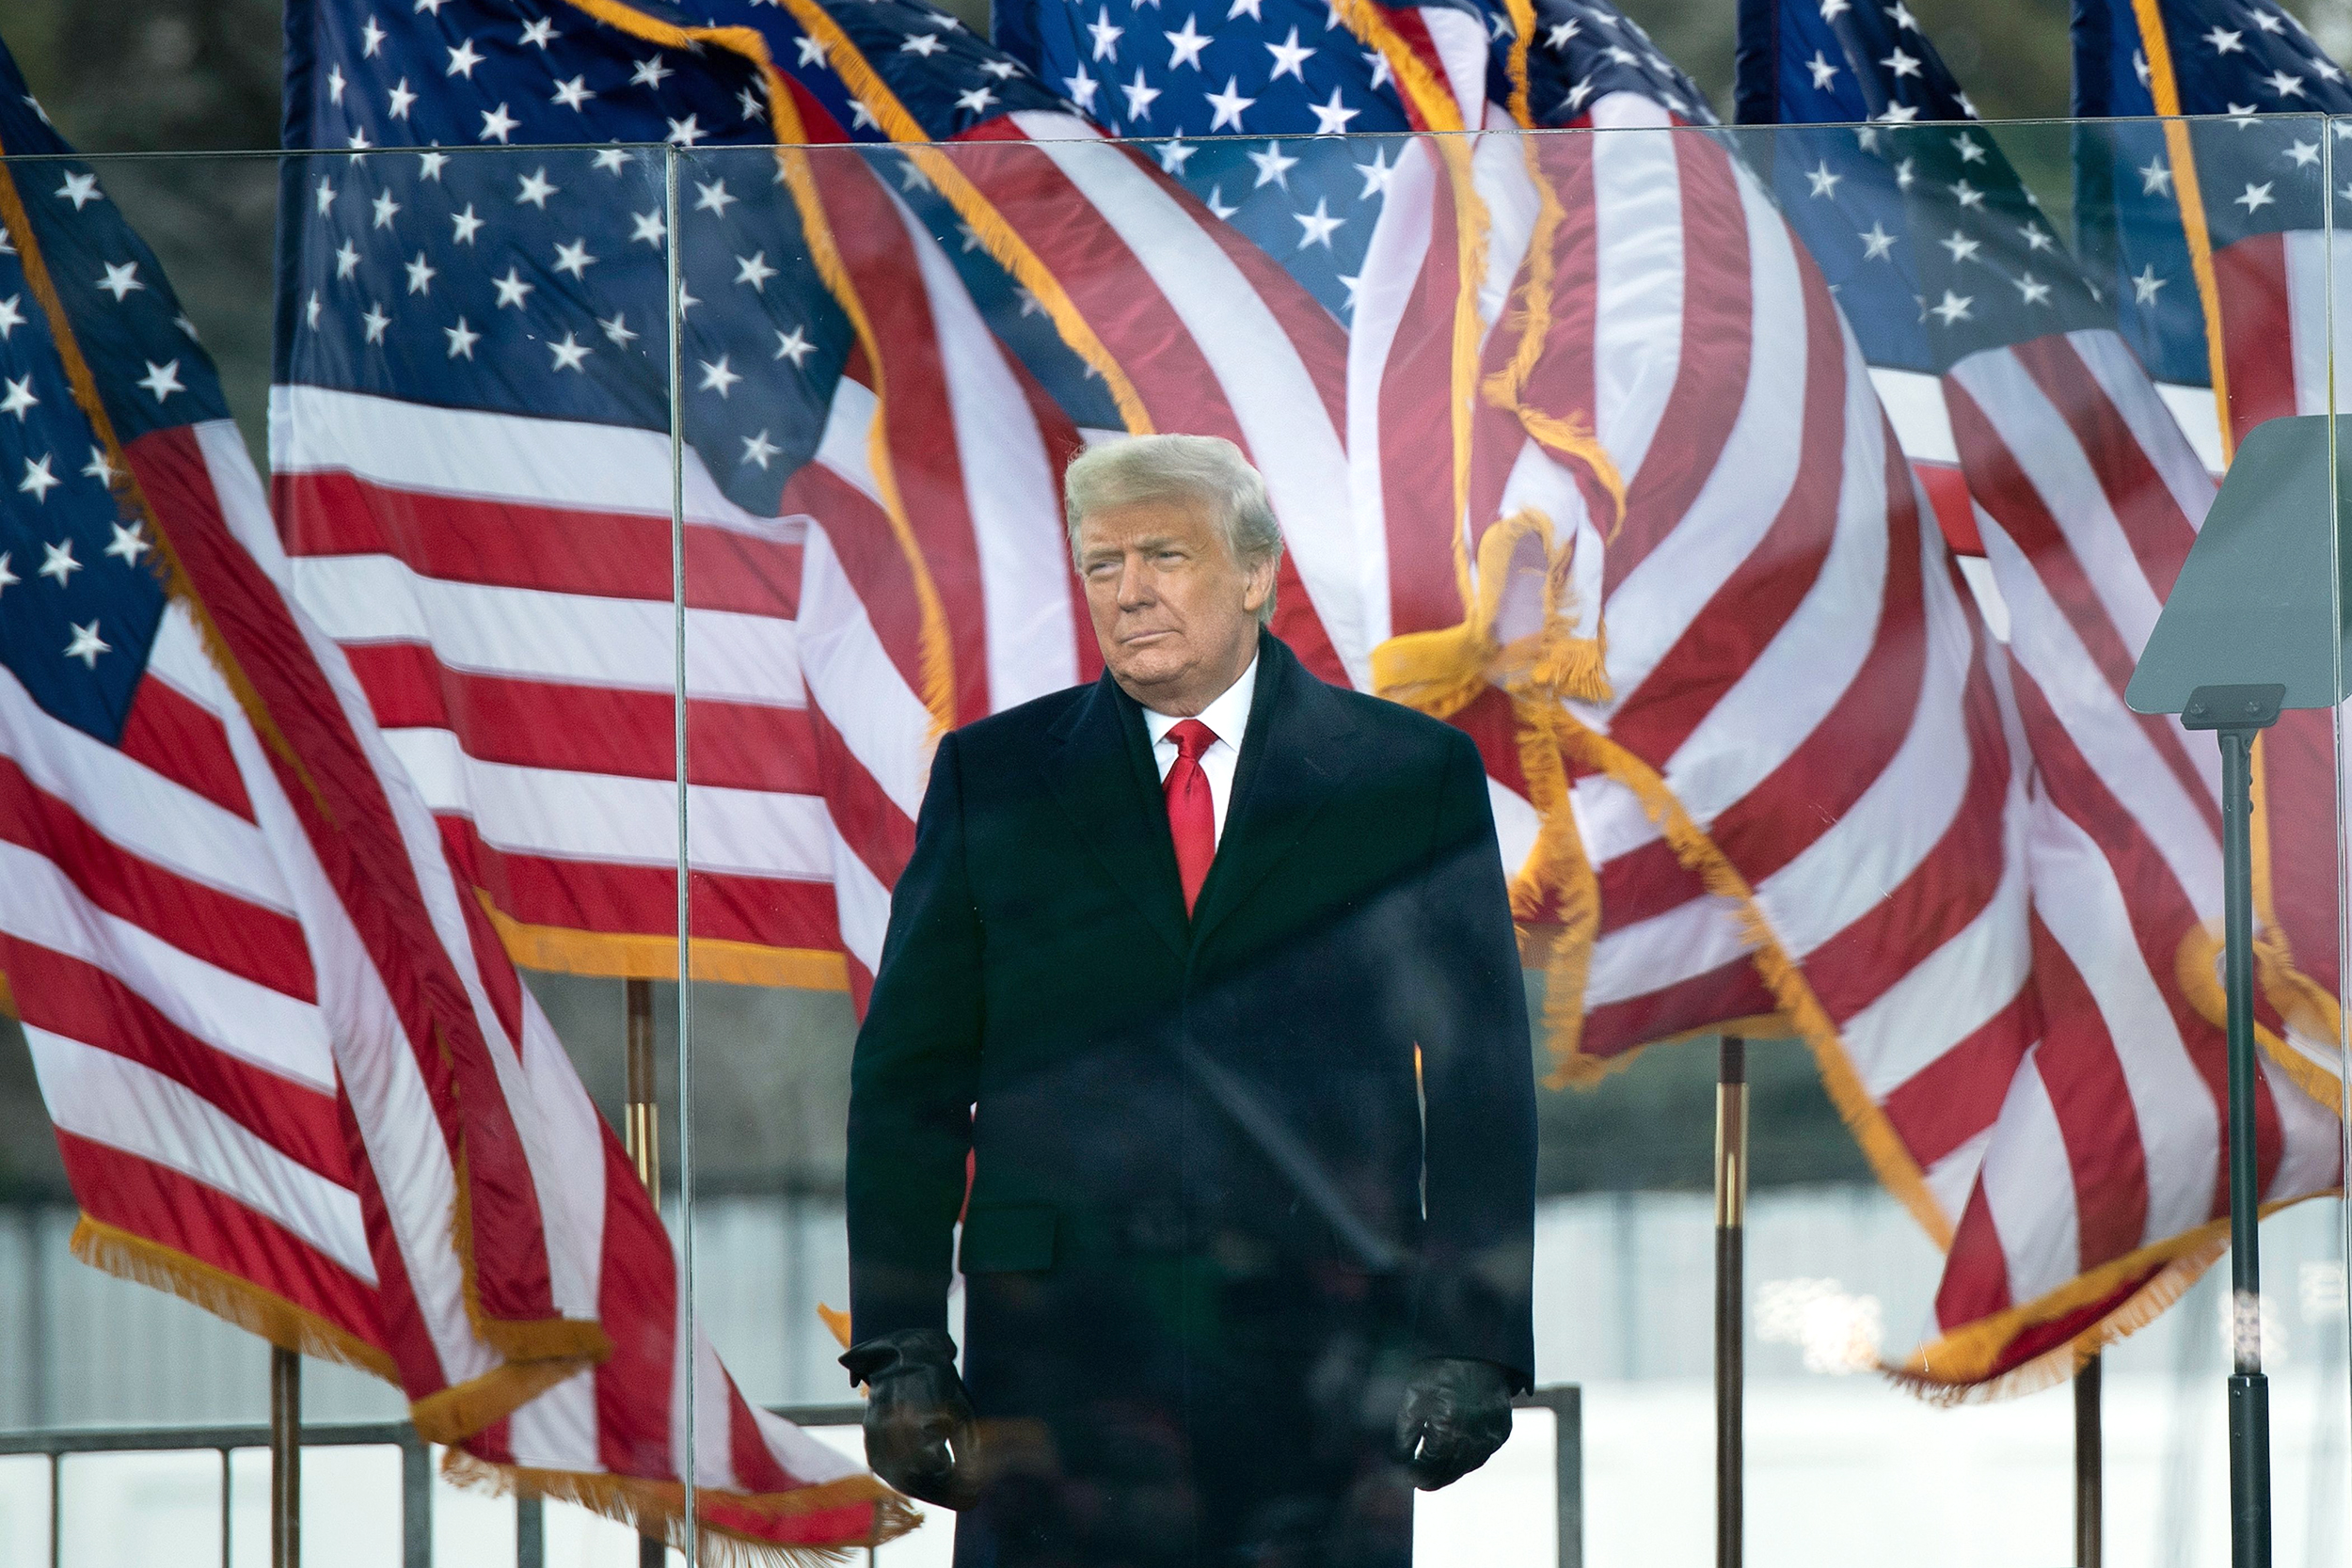 Biden will allow Jan. 6 investigators access to Trump records, White House says